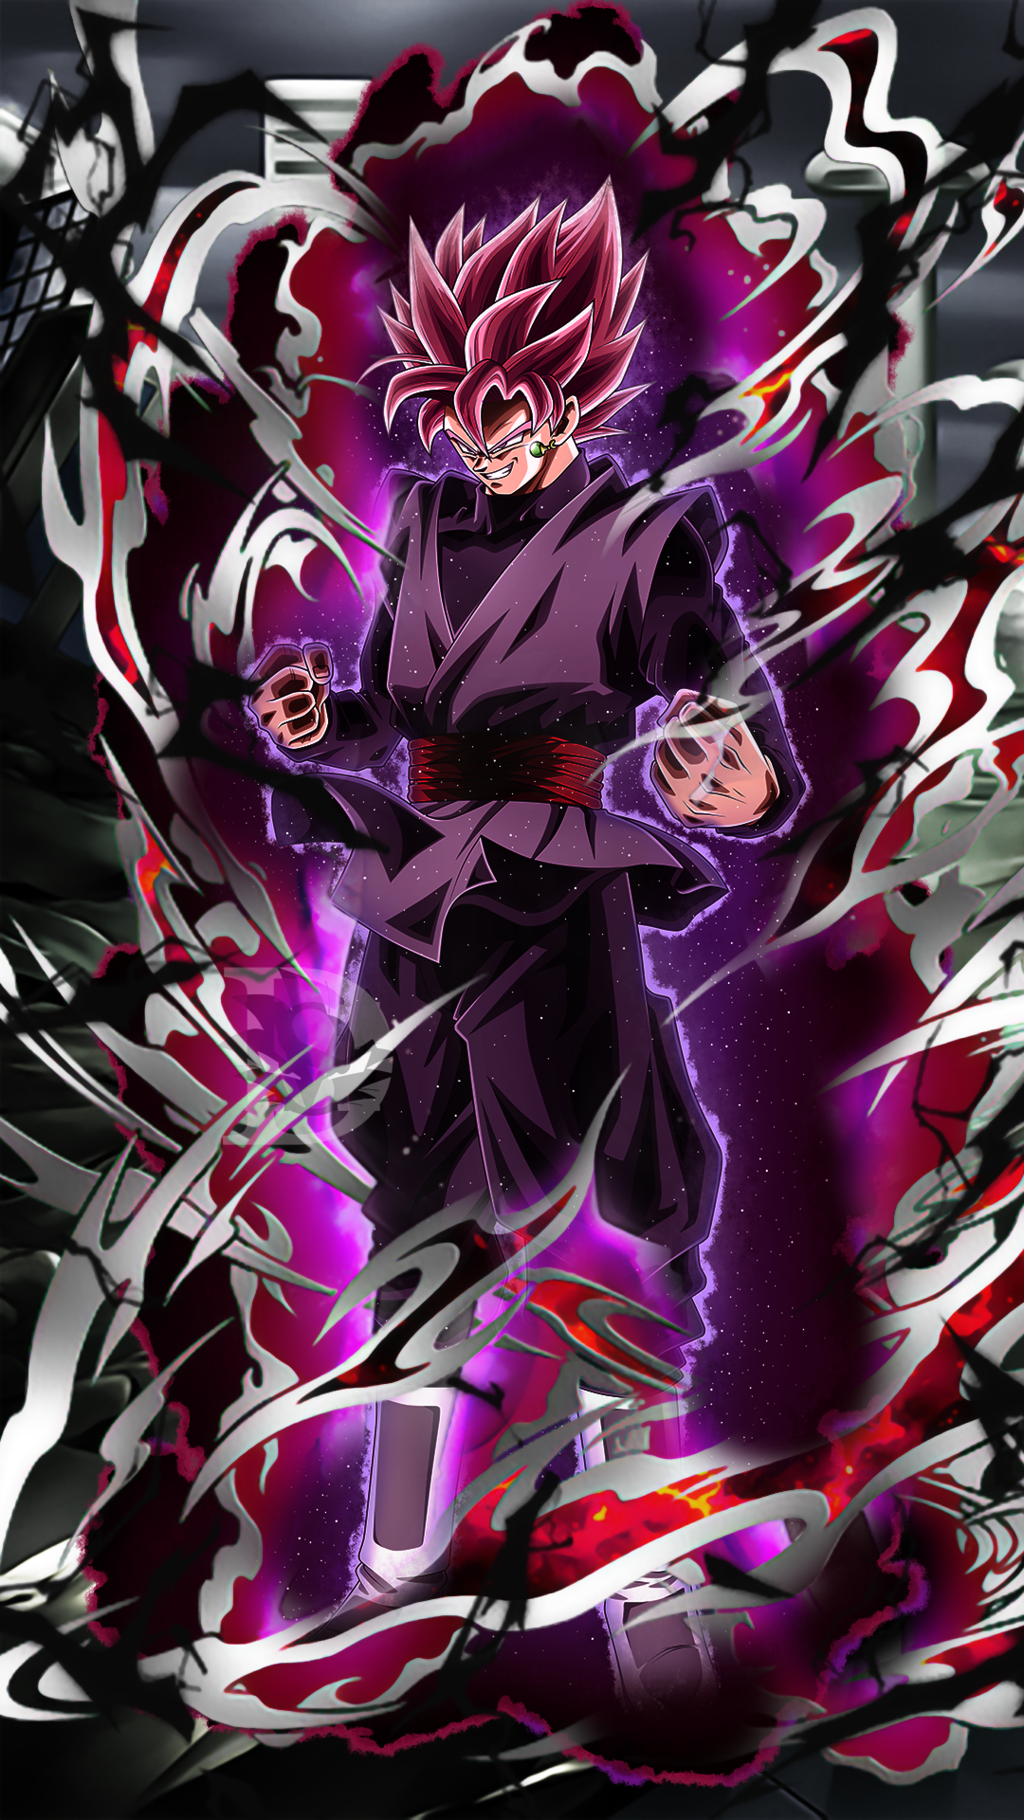 Black Goku Rose Wallpapers Wallpaper Cave